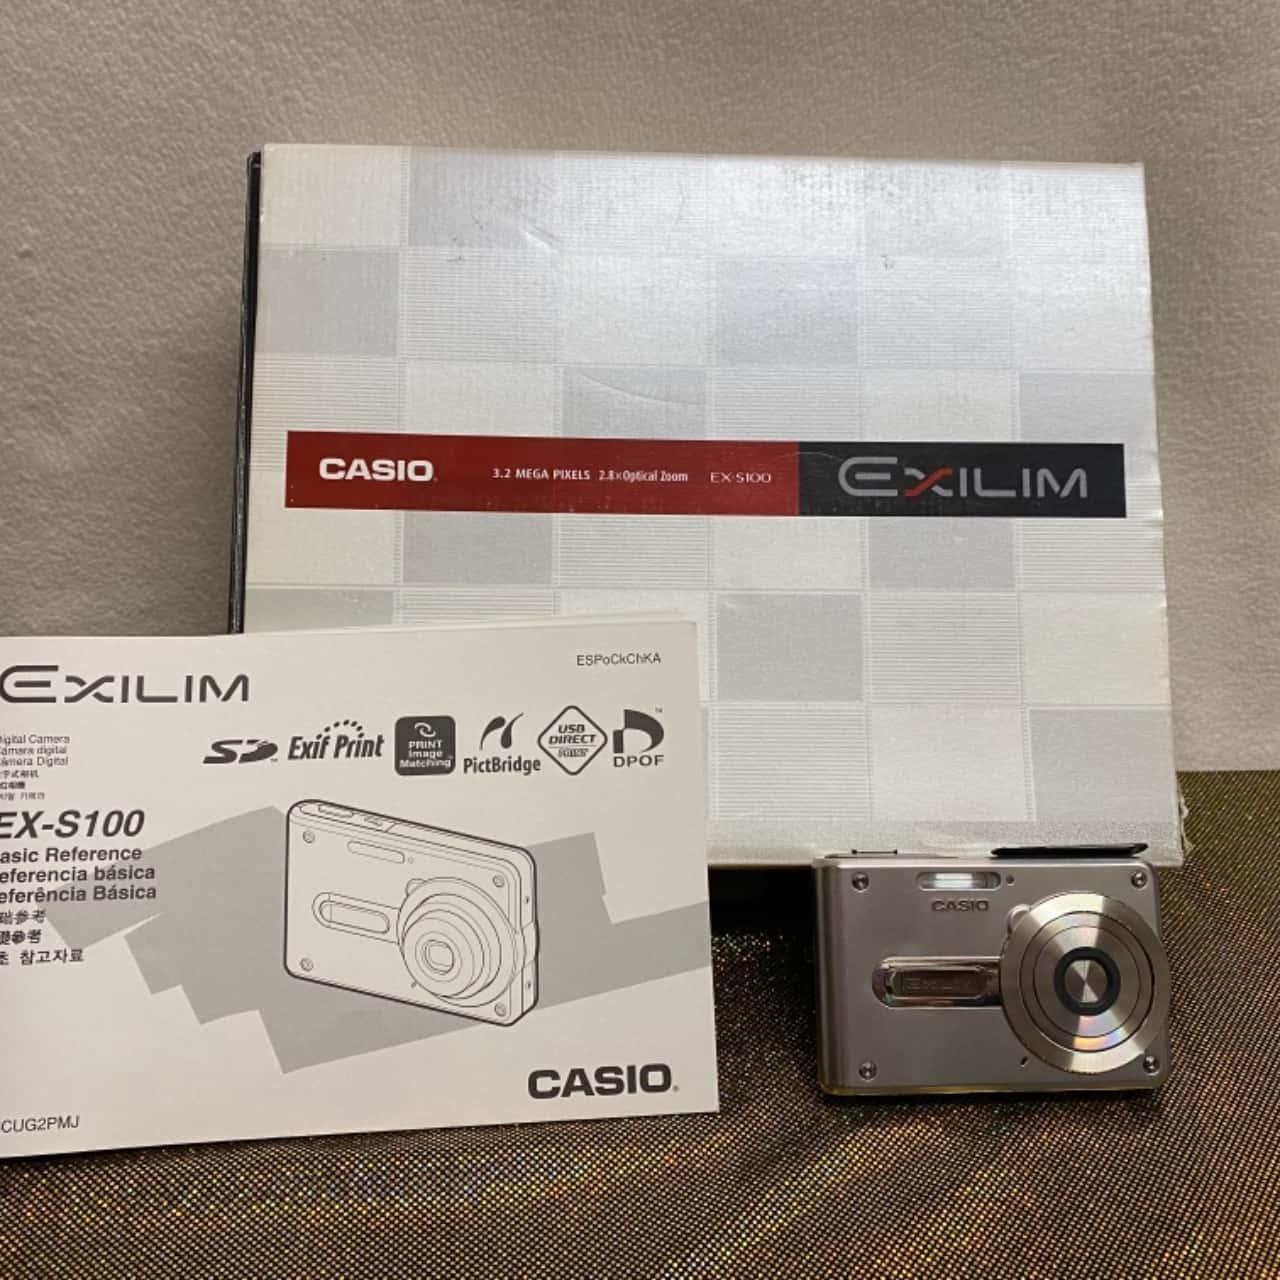 CASIO EX-S100 digital camera brand new